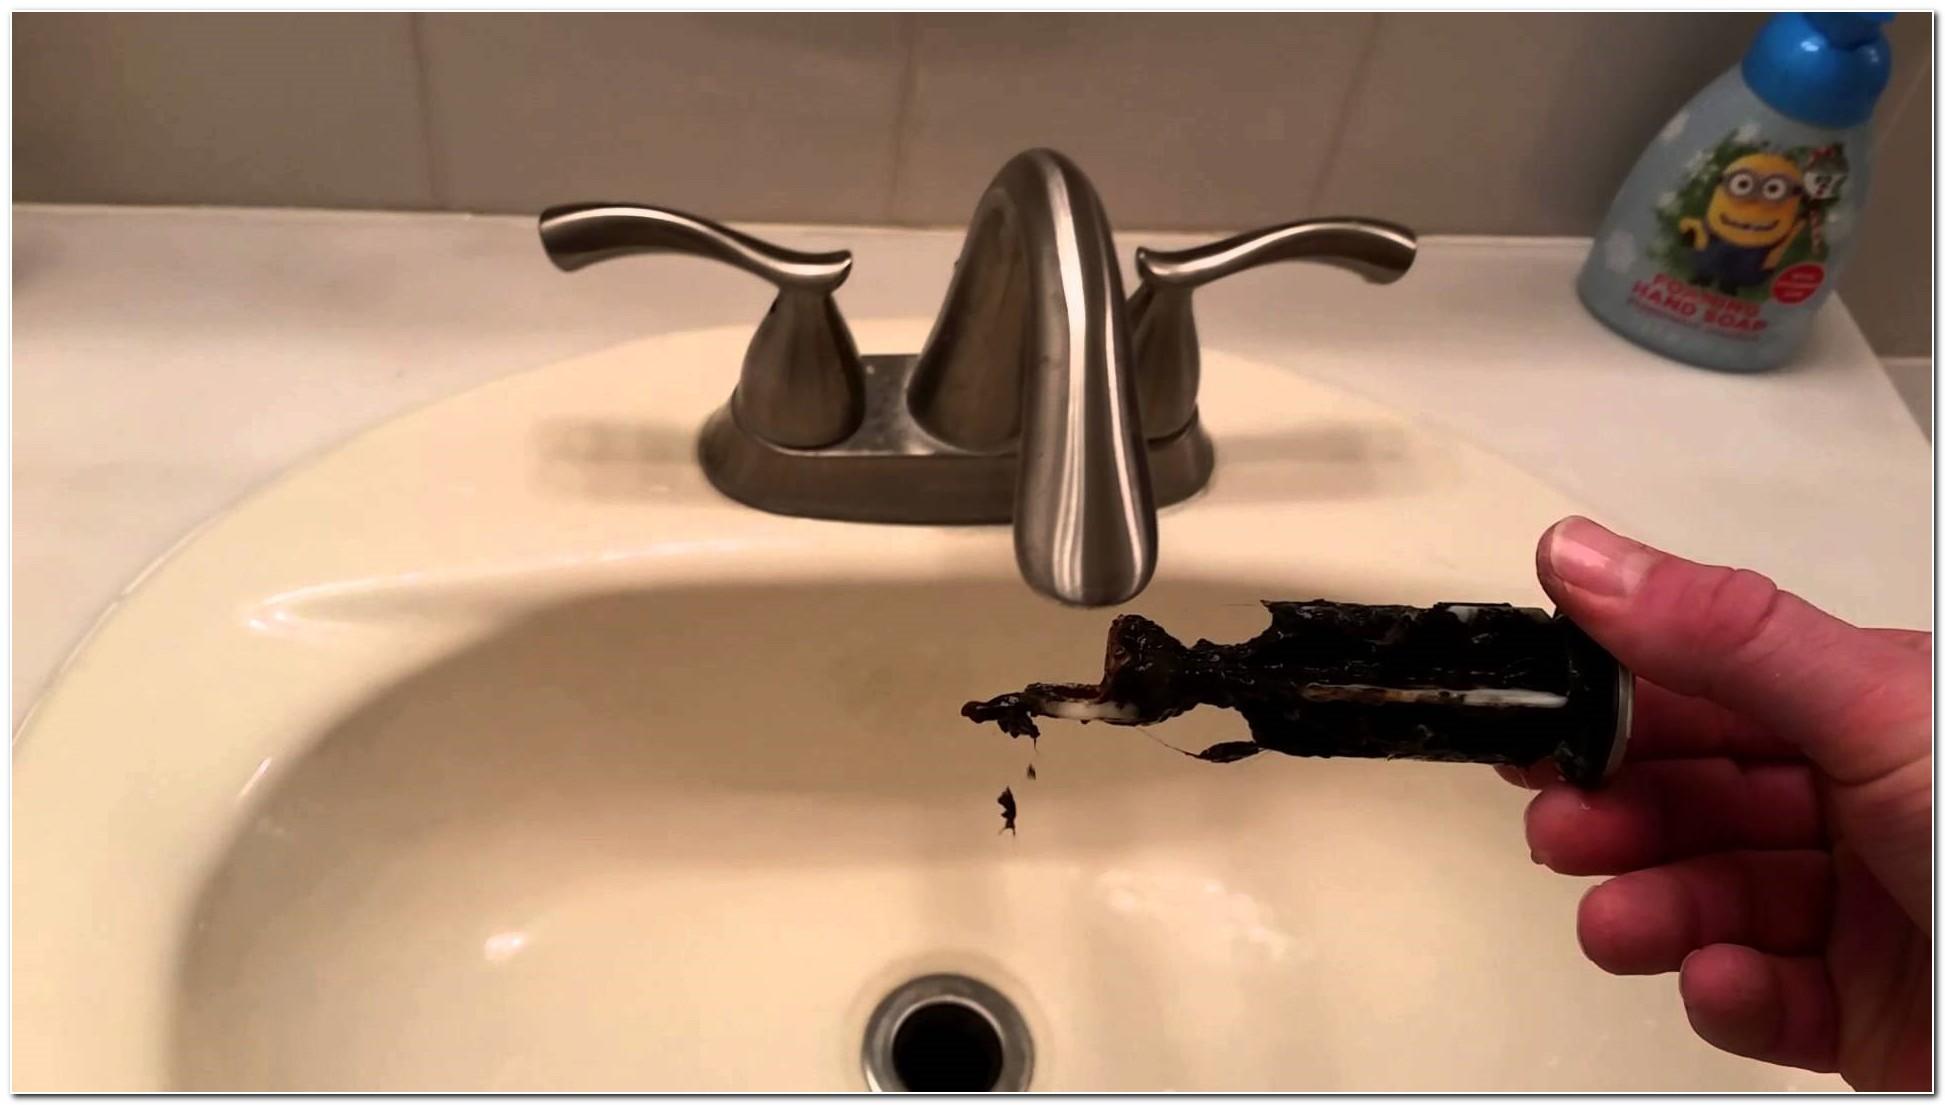 Bathroom Sink Drain Cover Remove